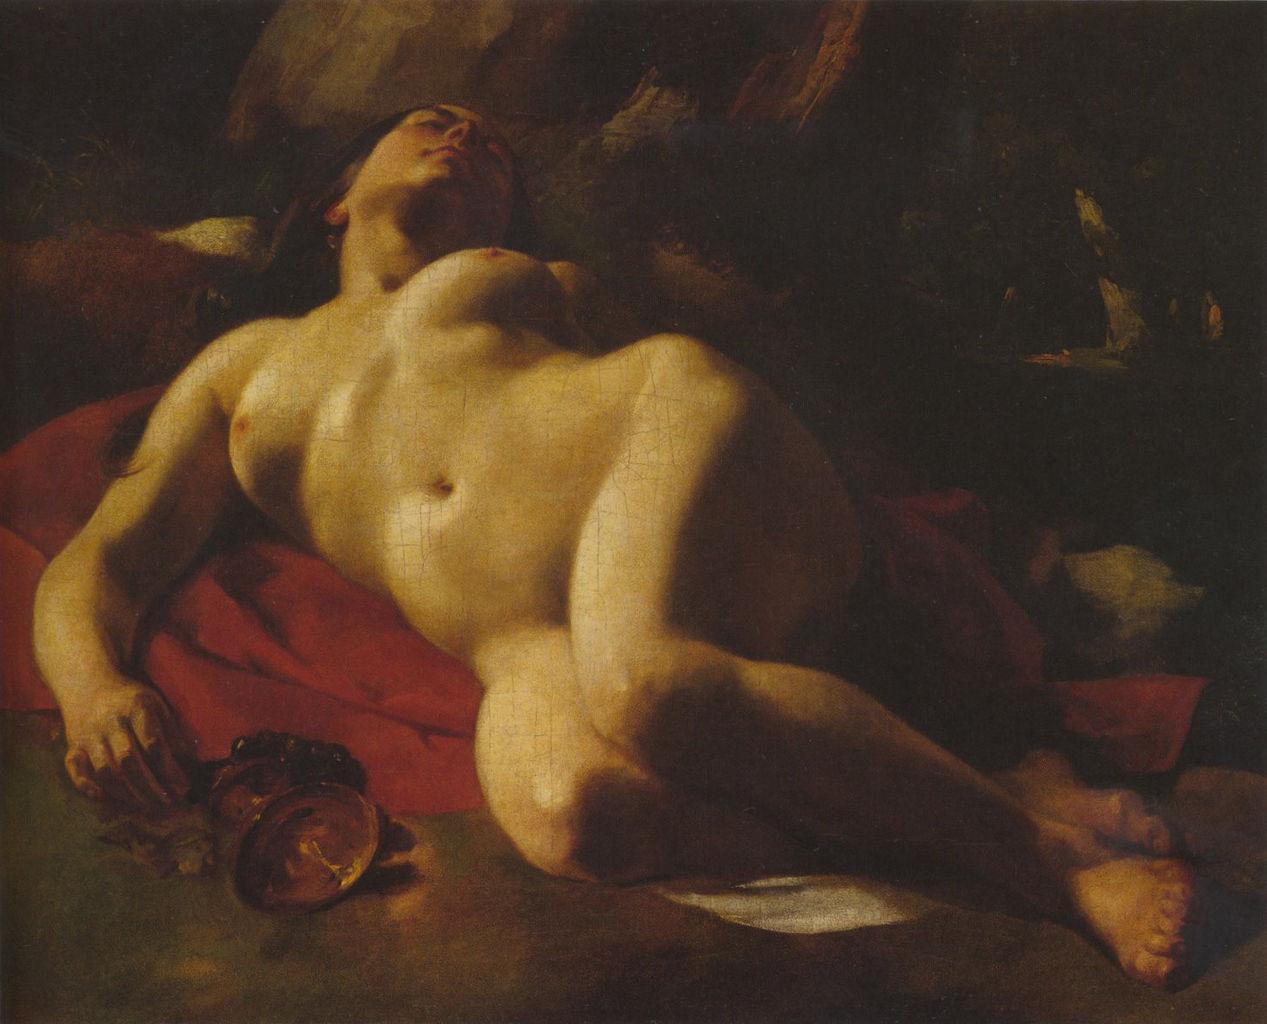 http://upload.wikimedia.org/wikipedia/commons/thumb/b/b5/La_Bacchante_Courbet.jpg/1267px-La_Bacchante_Courbet.jpg